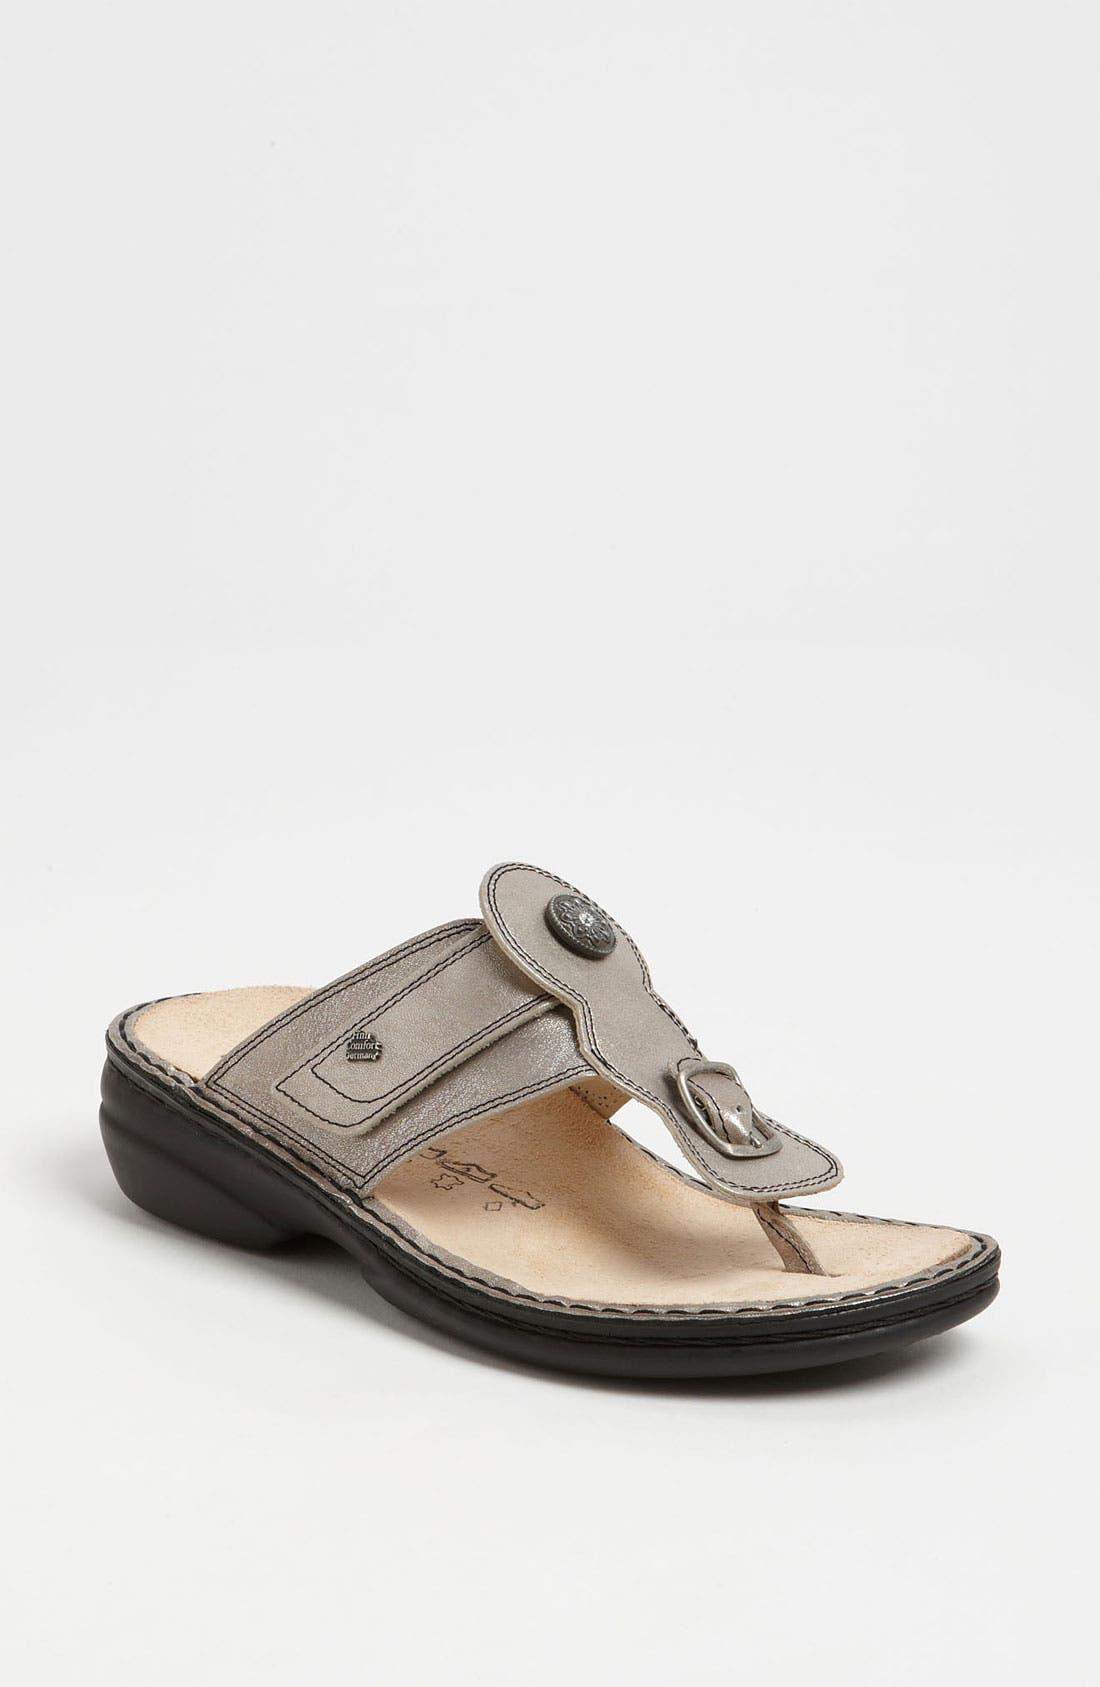 Main Image - Finn Comfort 'Witchita' Sandal